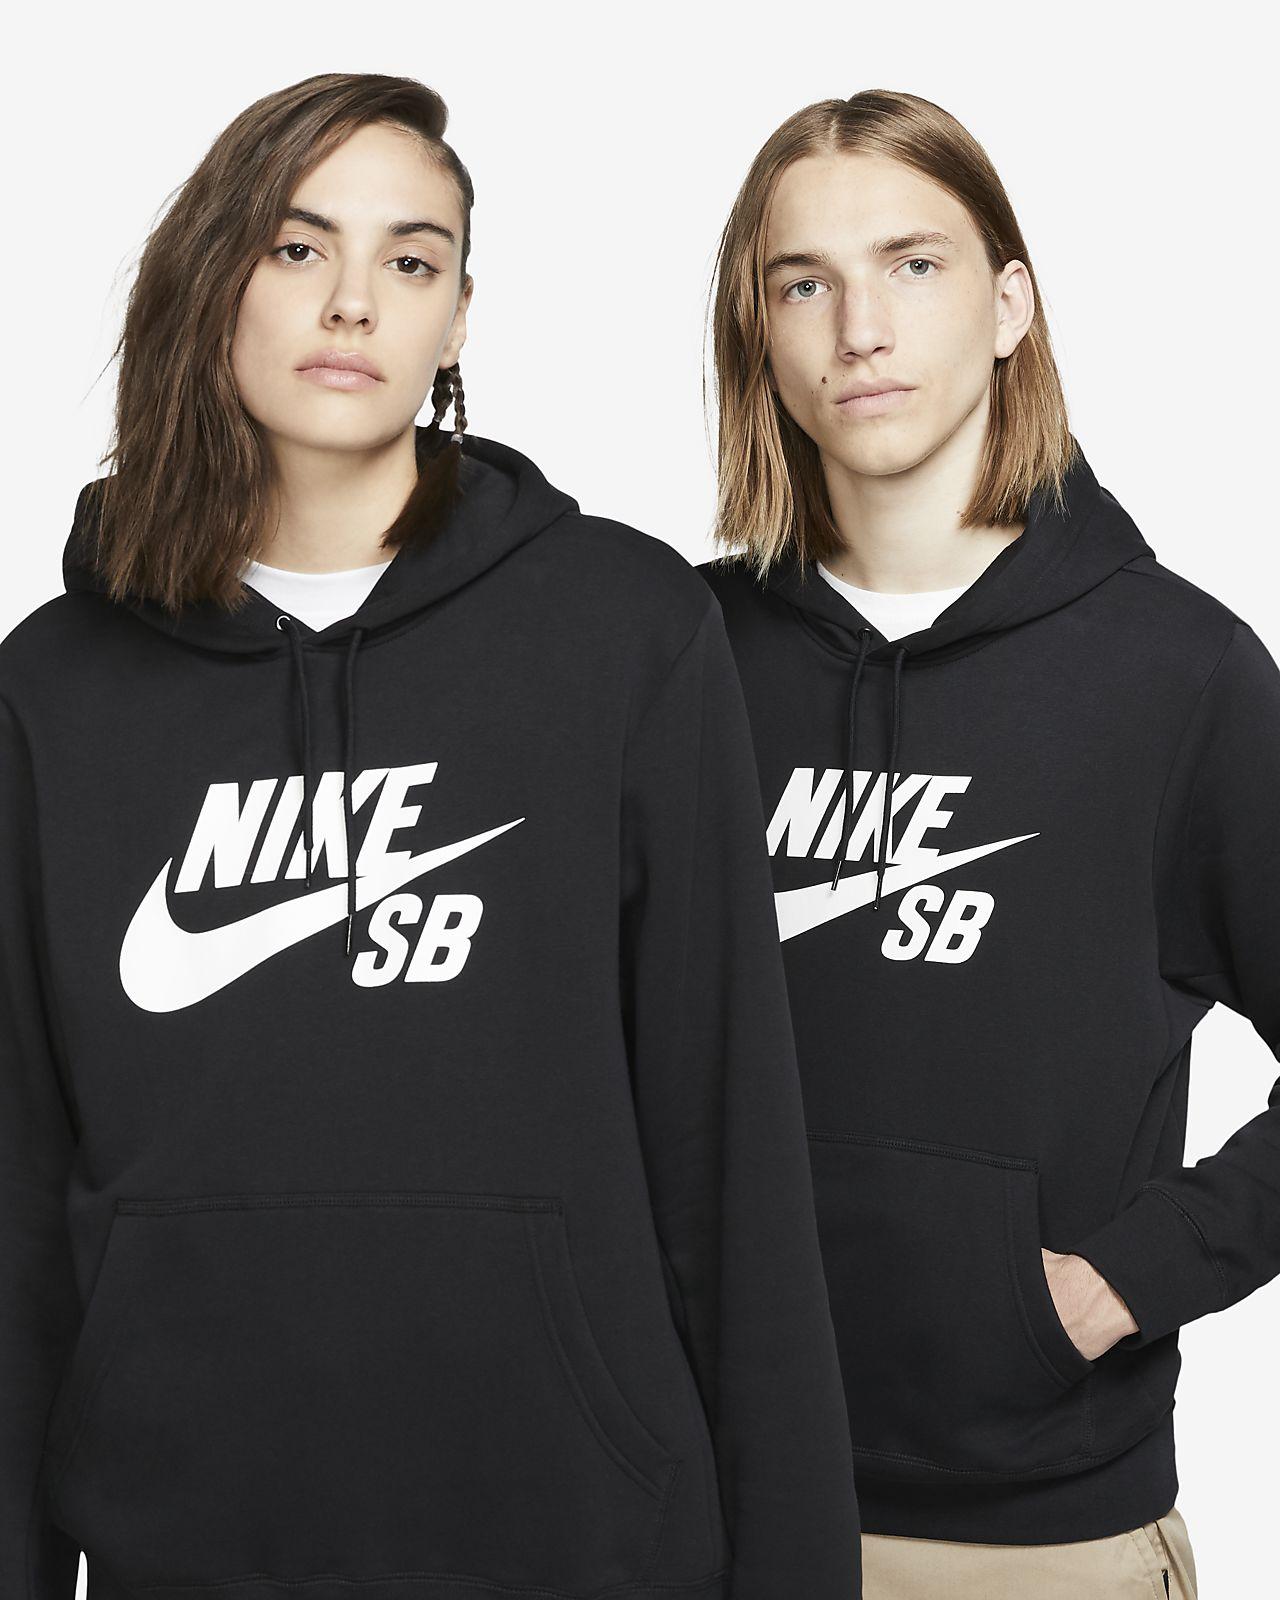 scontato Nike Felpe Pullover Donne Darkgrey Nero Nike